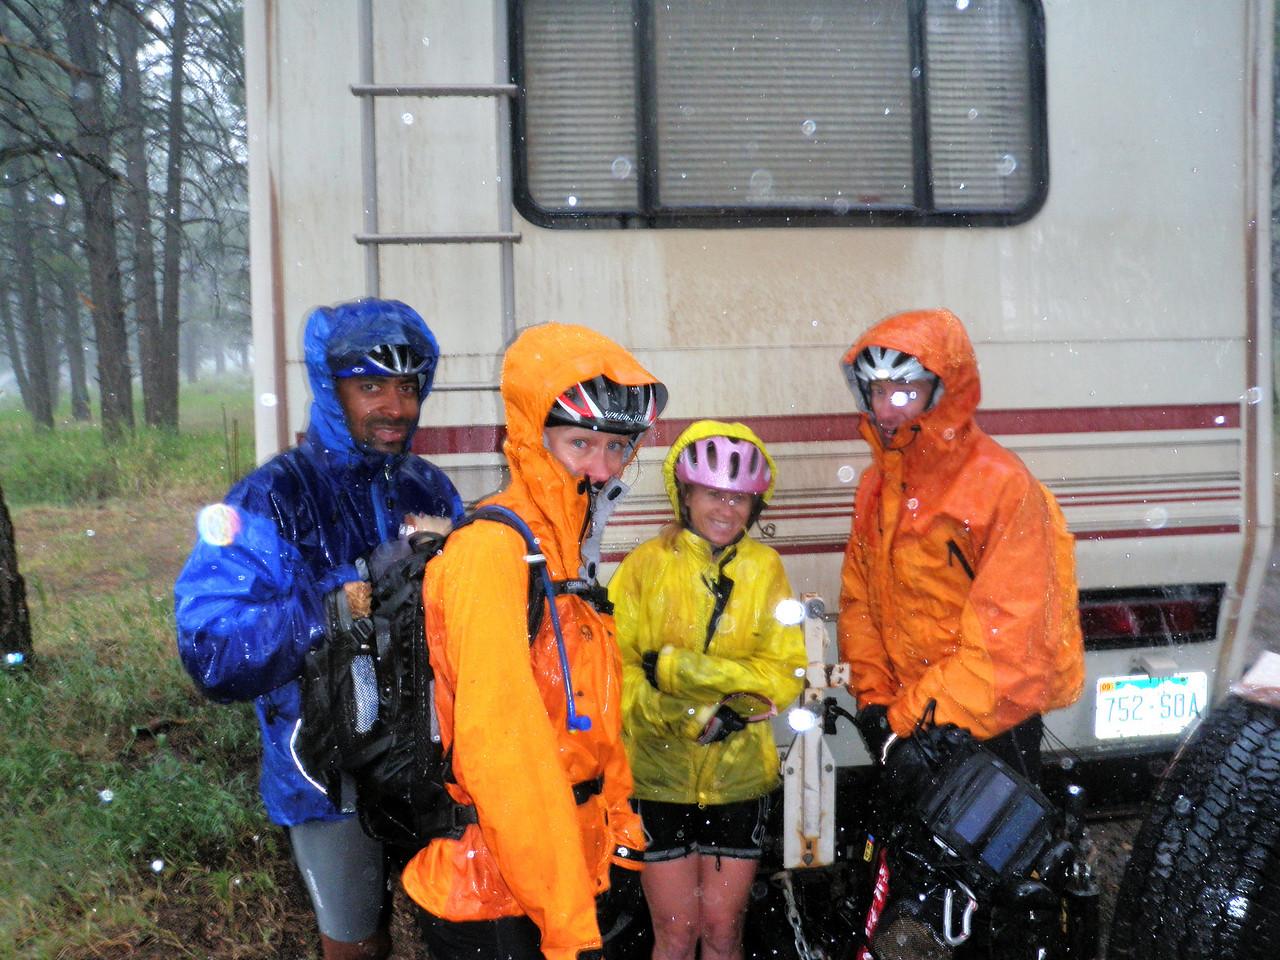 Day 6 Huddling in the Rain